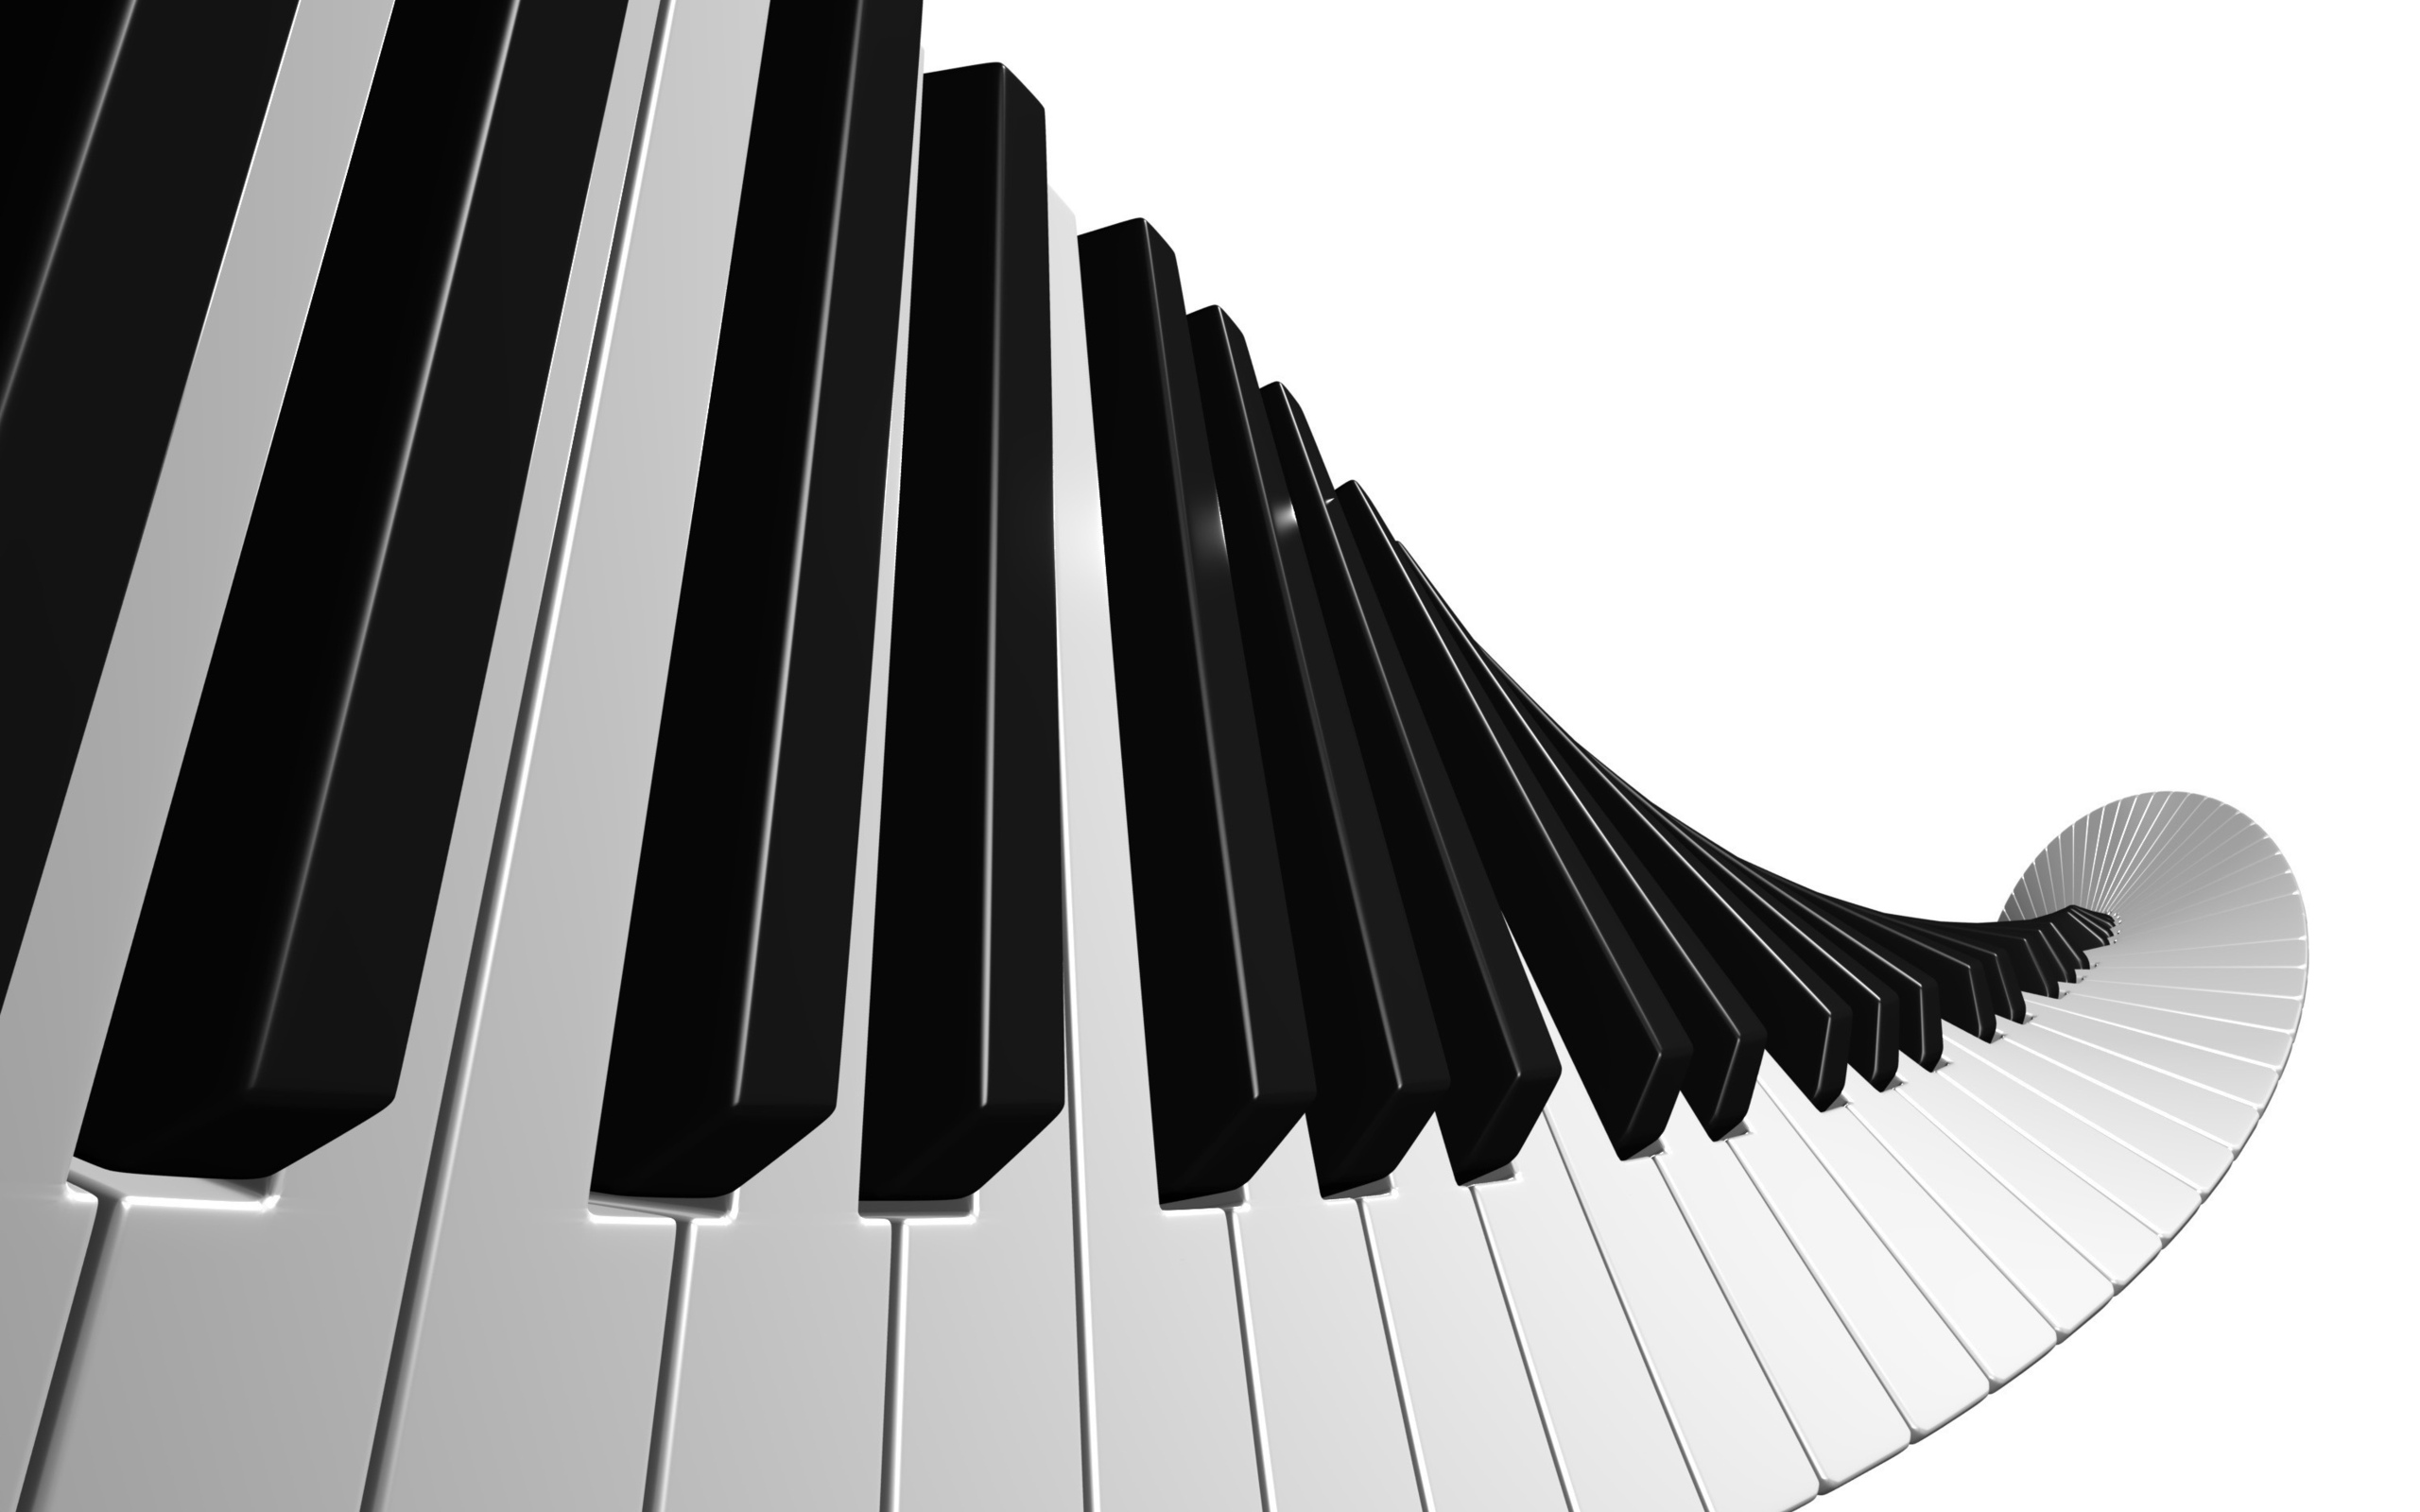 Piano HD Wallpaper | Background Image | 2560x1600 | ID ...